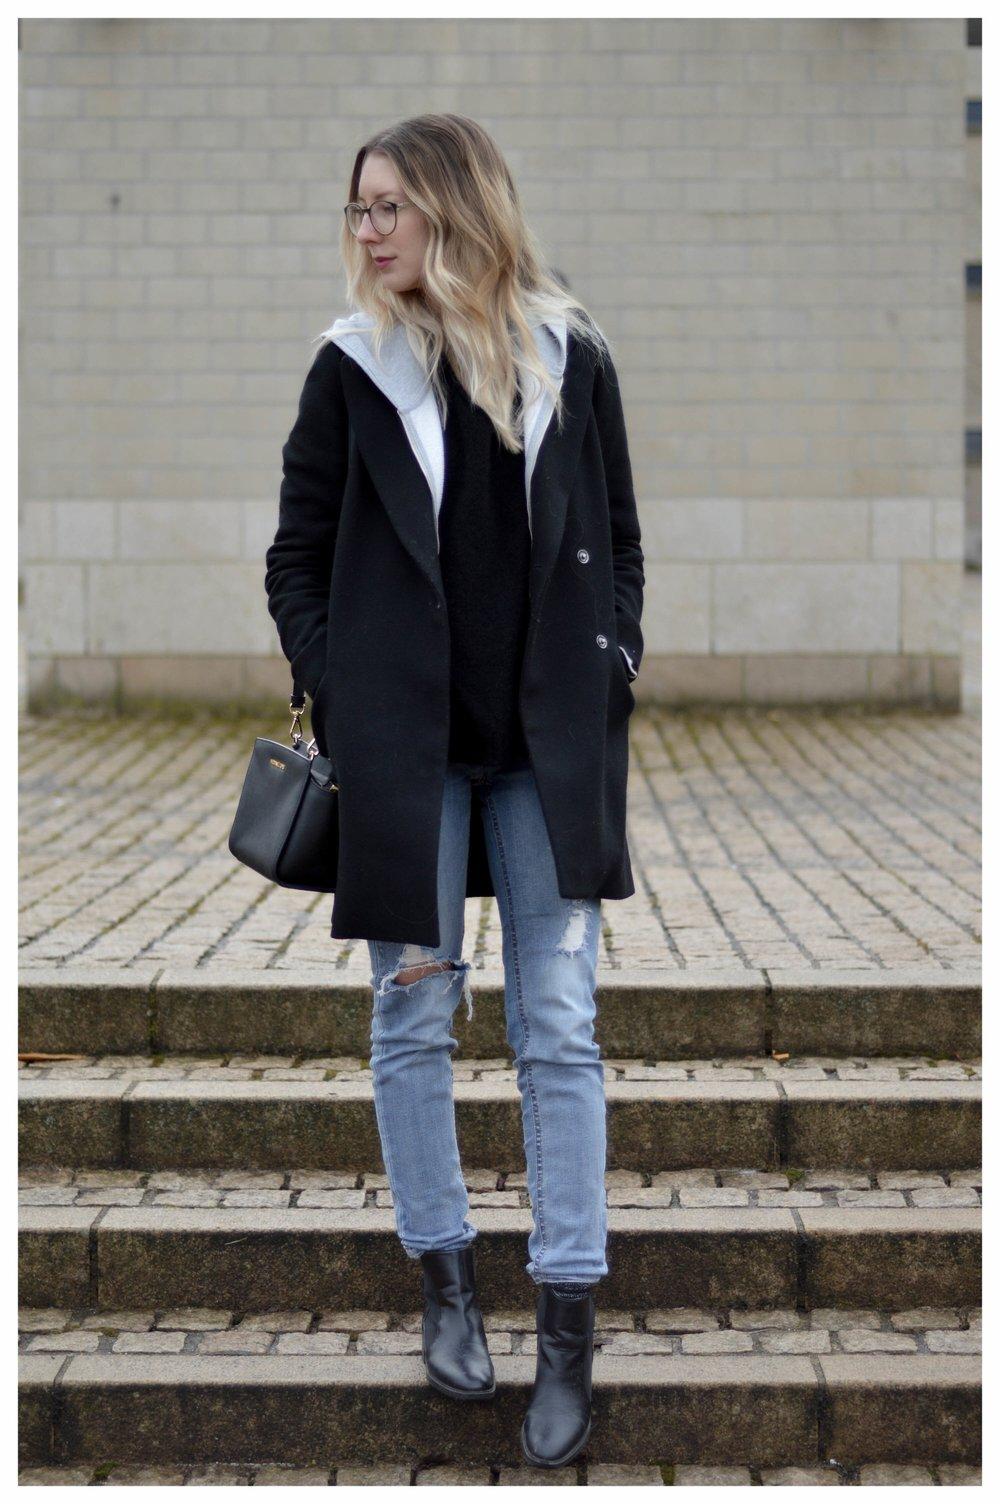 Black Coat Hoodie & Ripped Jeans - OSIARAH.COM (9 sur 54).jpg